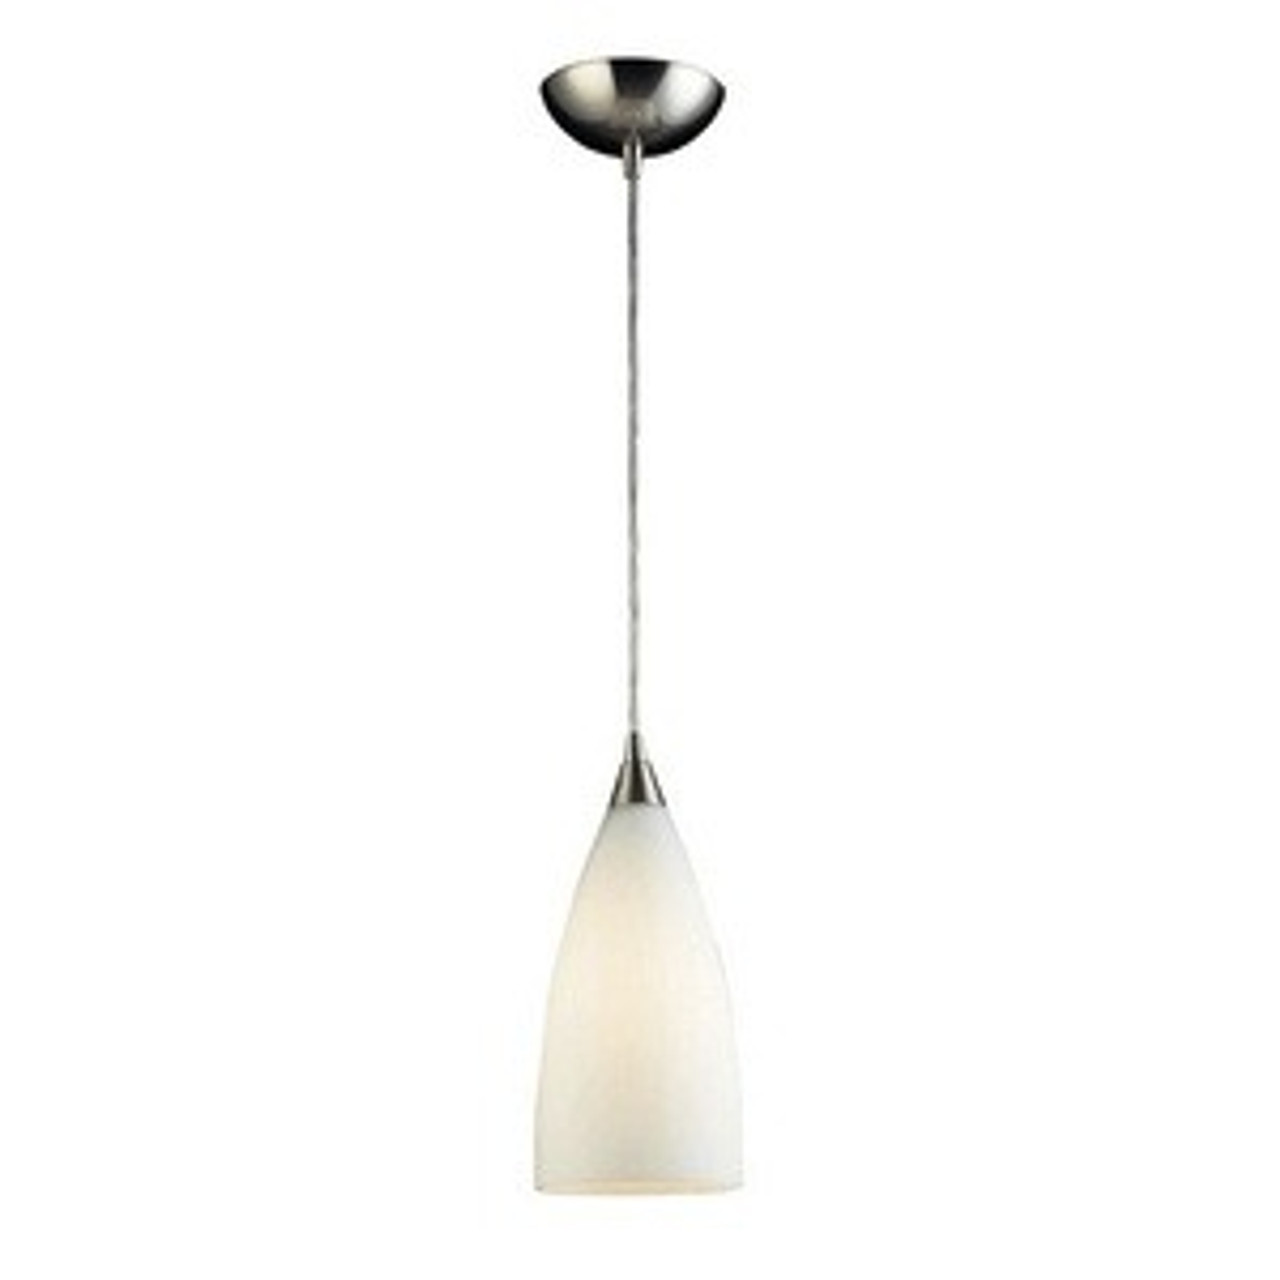 "Vesta - 12"" 9.5W 1 LED Mini Pendant, Satin Nickel Finish with White Glass, 120V, 10W, 800LM (2580-1-LED)"